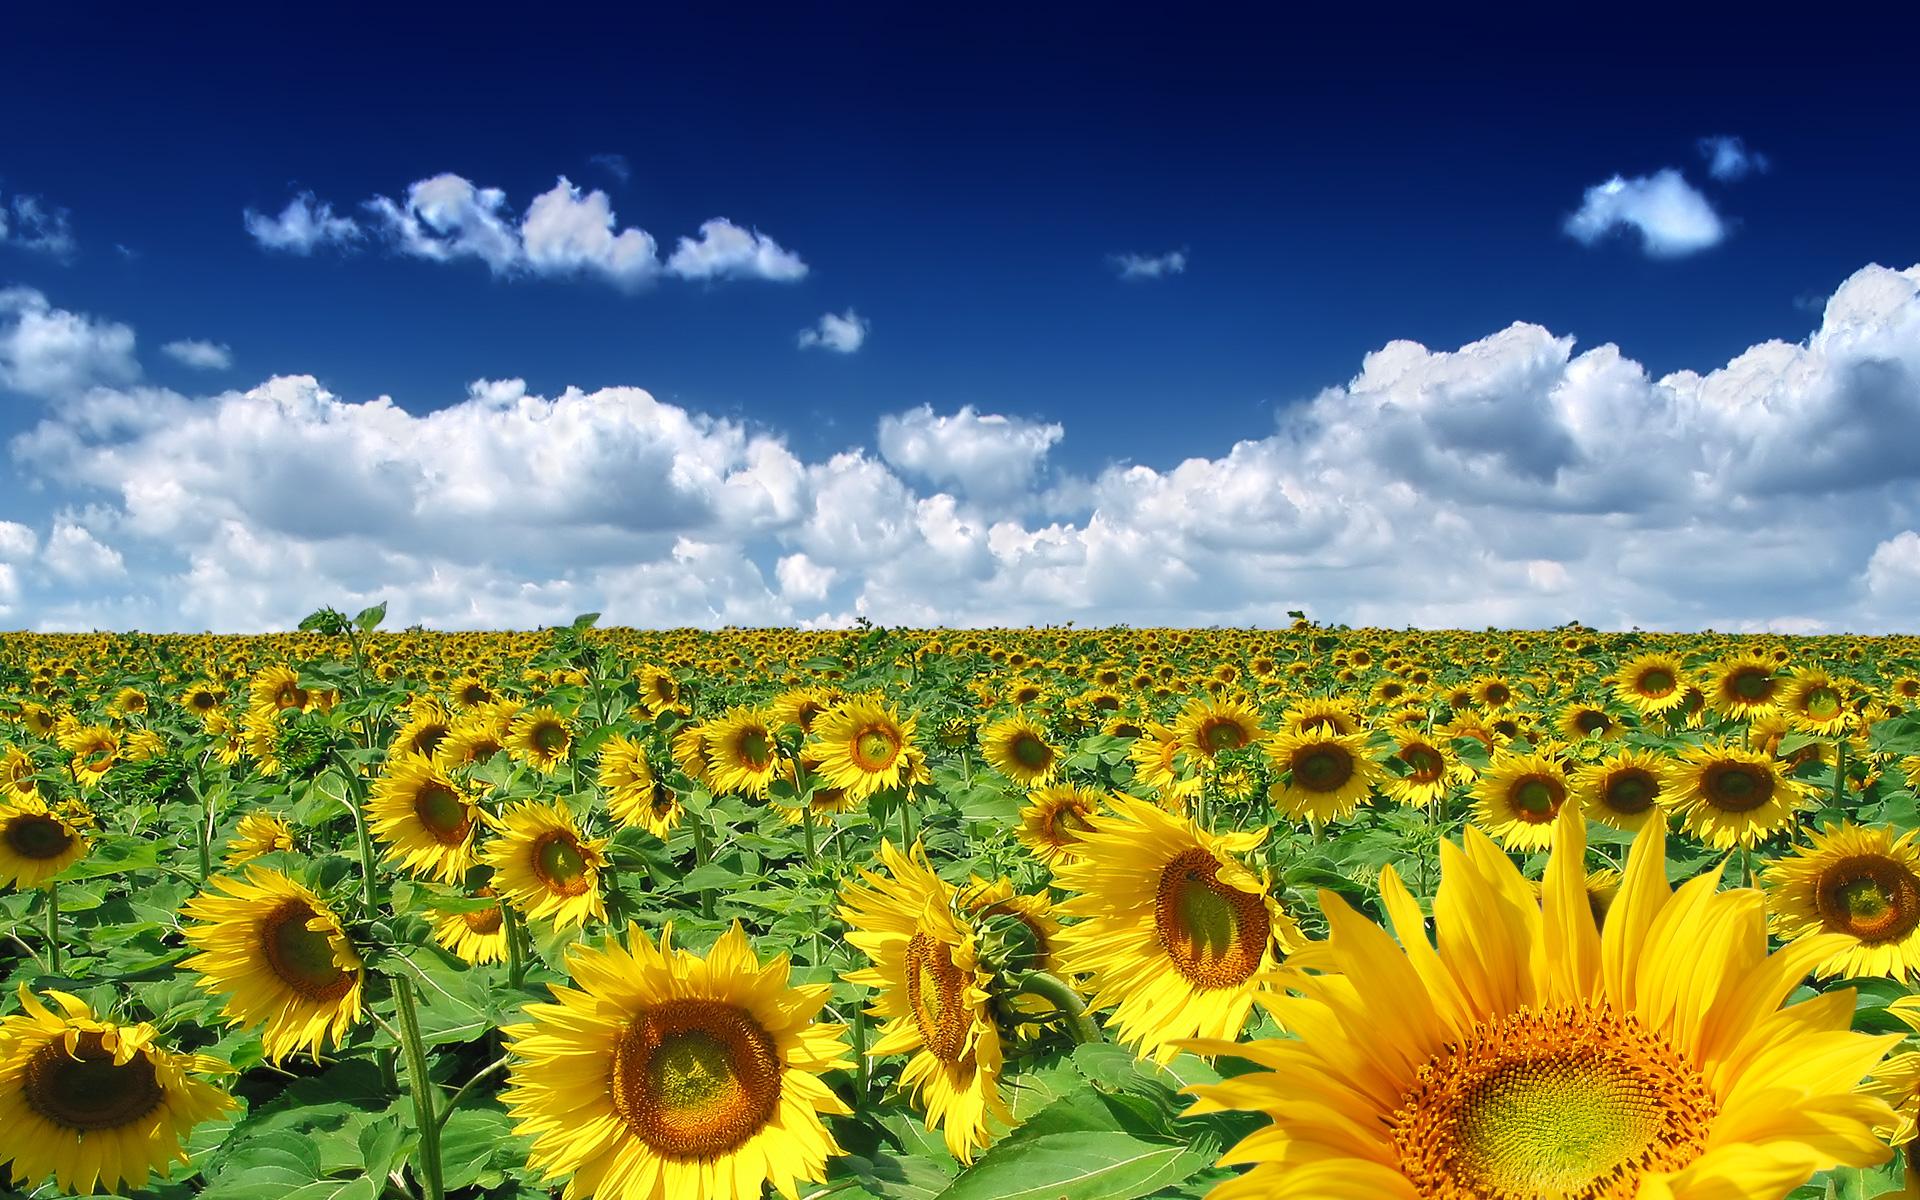 summer sunflowers andrea - photo #28